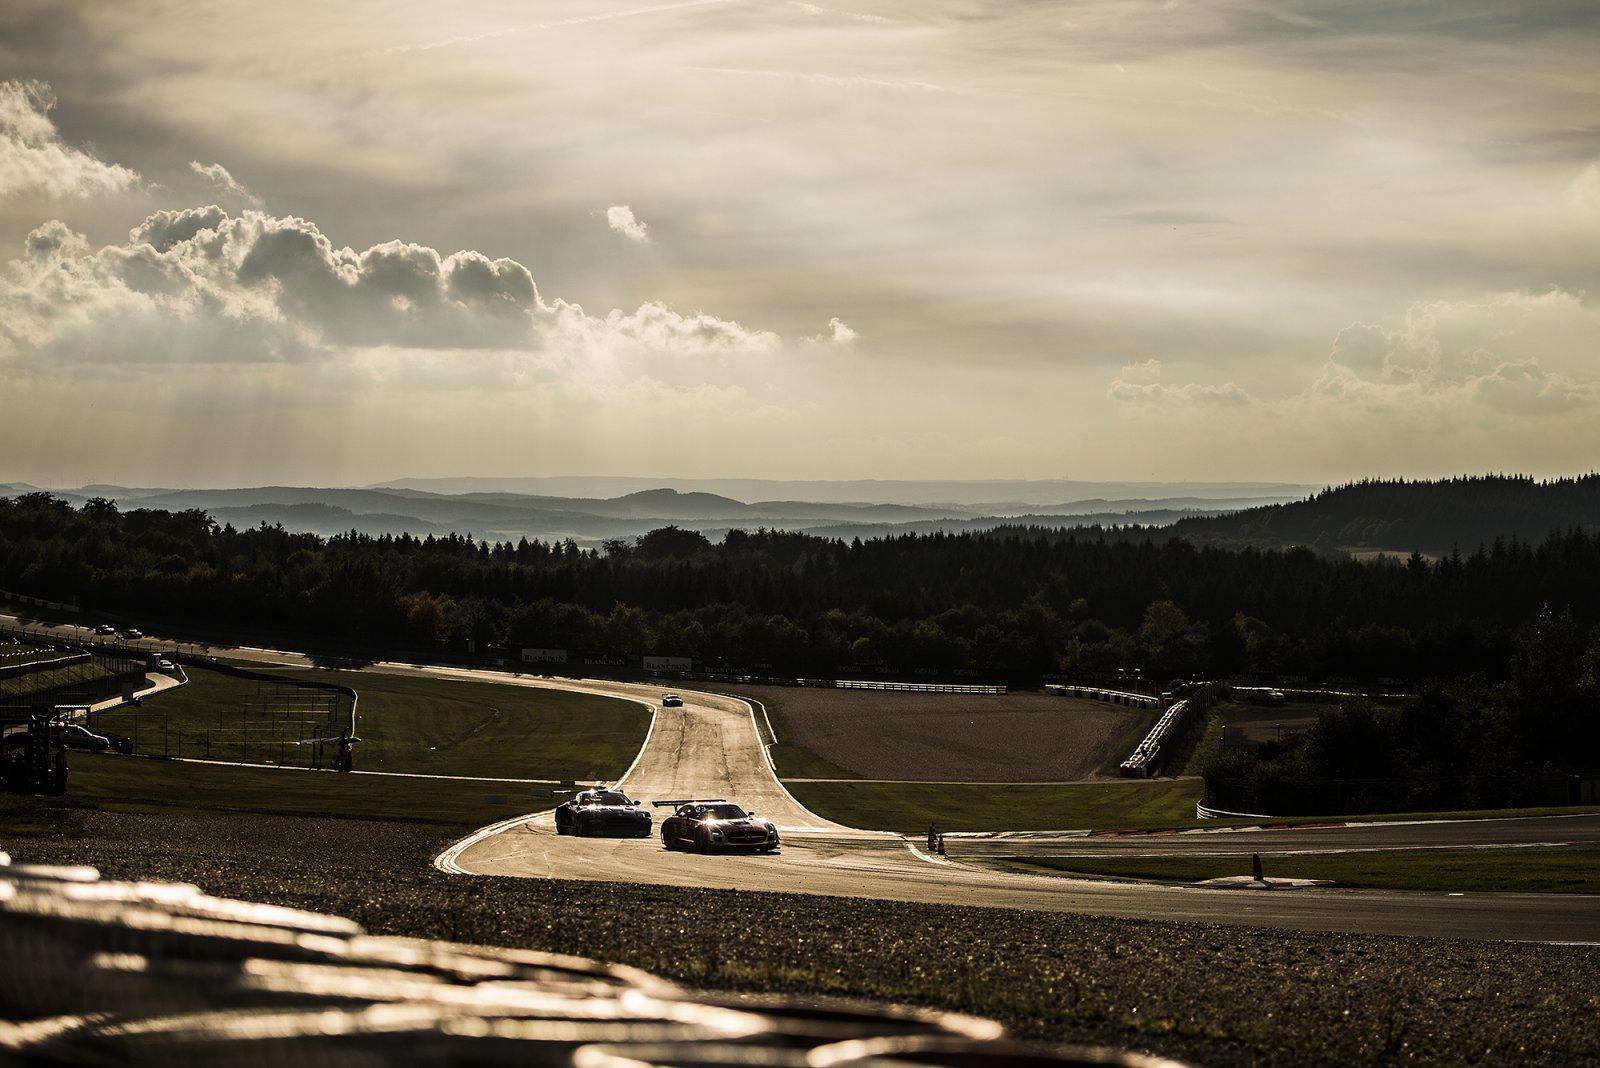 Nürburgring ready for Blancpain Endurance Series' final